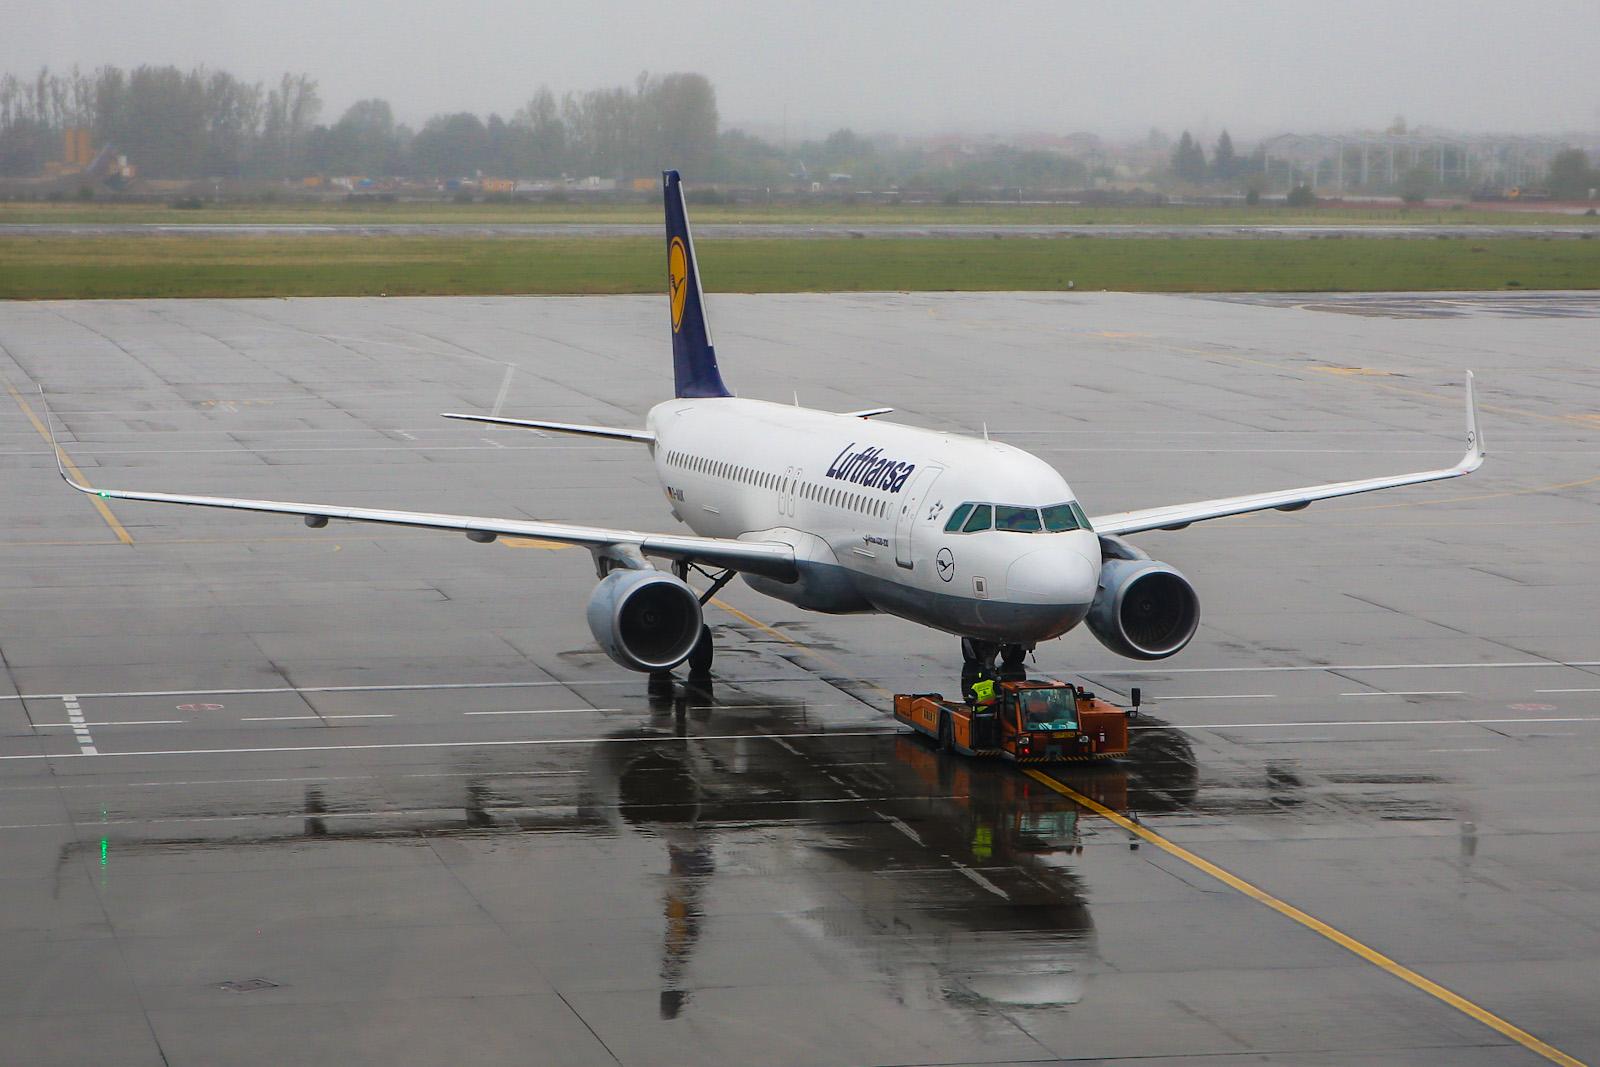 Airbus A320 авиакомпании Lufthansa в аэропорту Бухареста